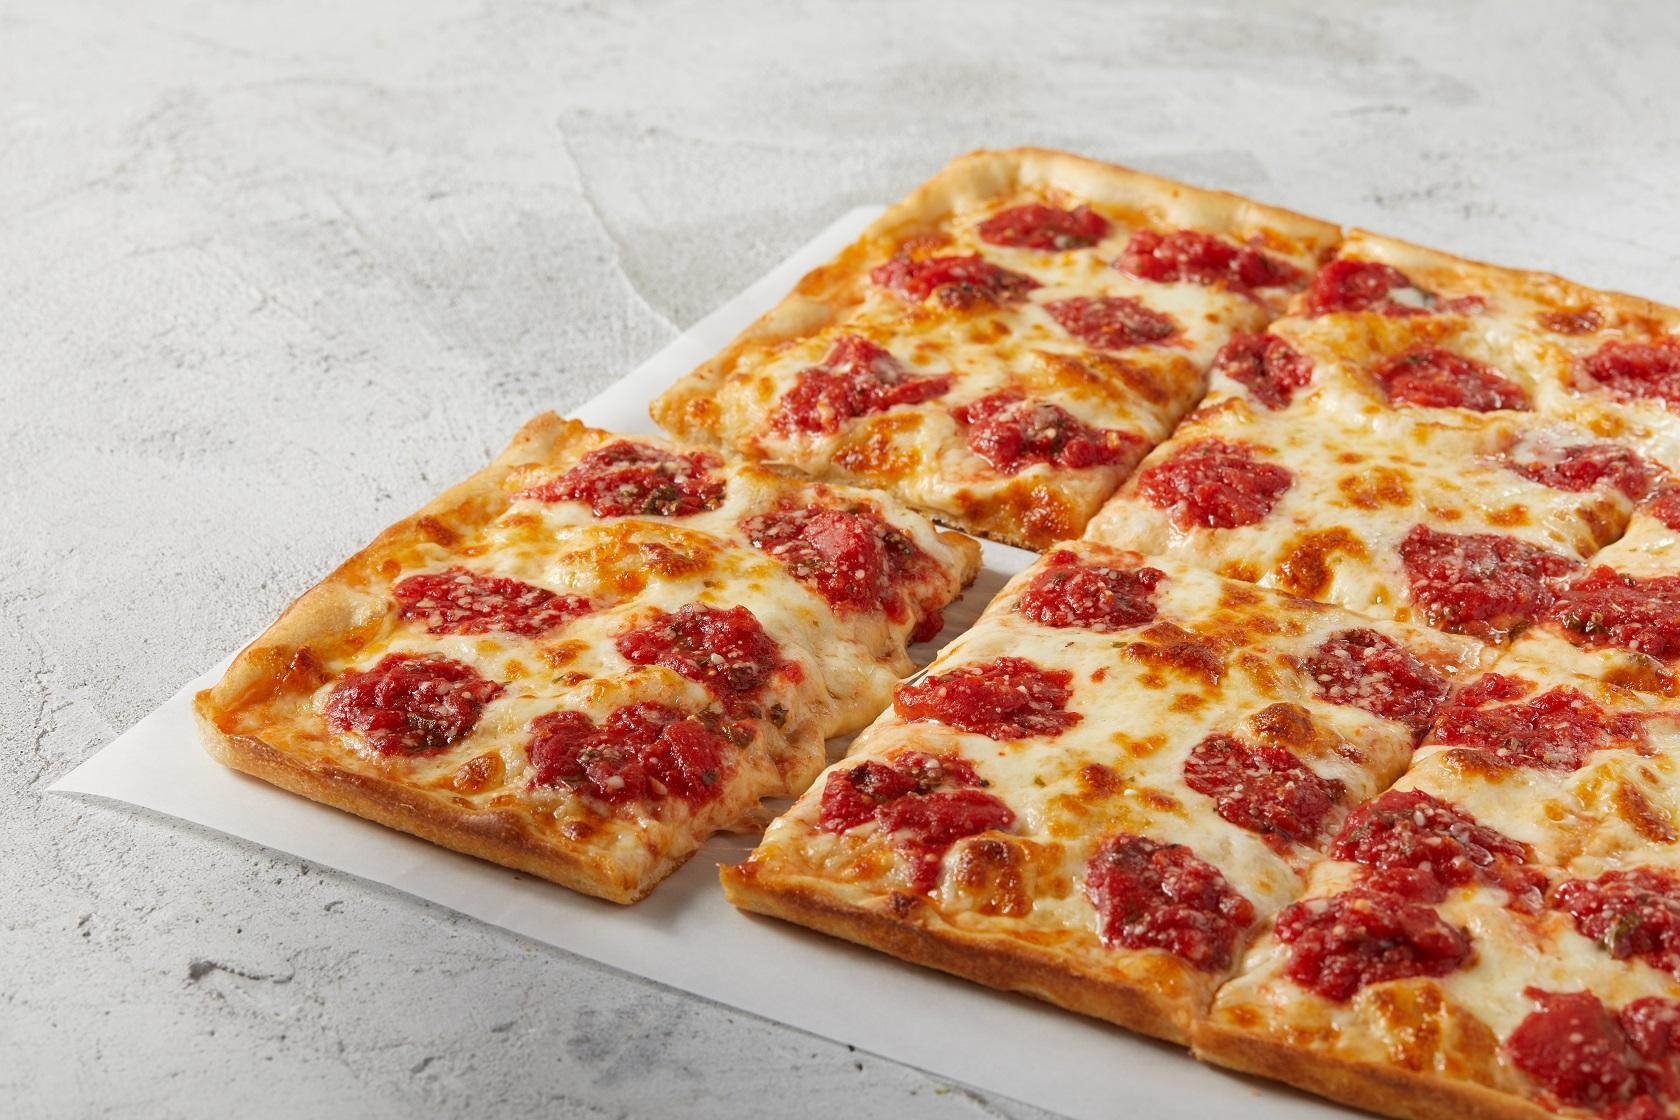 Need something thicker? Sbarro has thicker-crust Roman pizza.